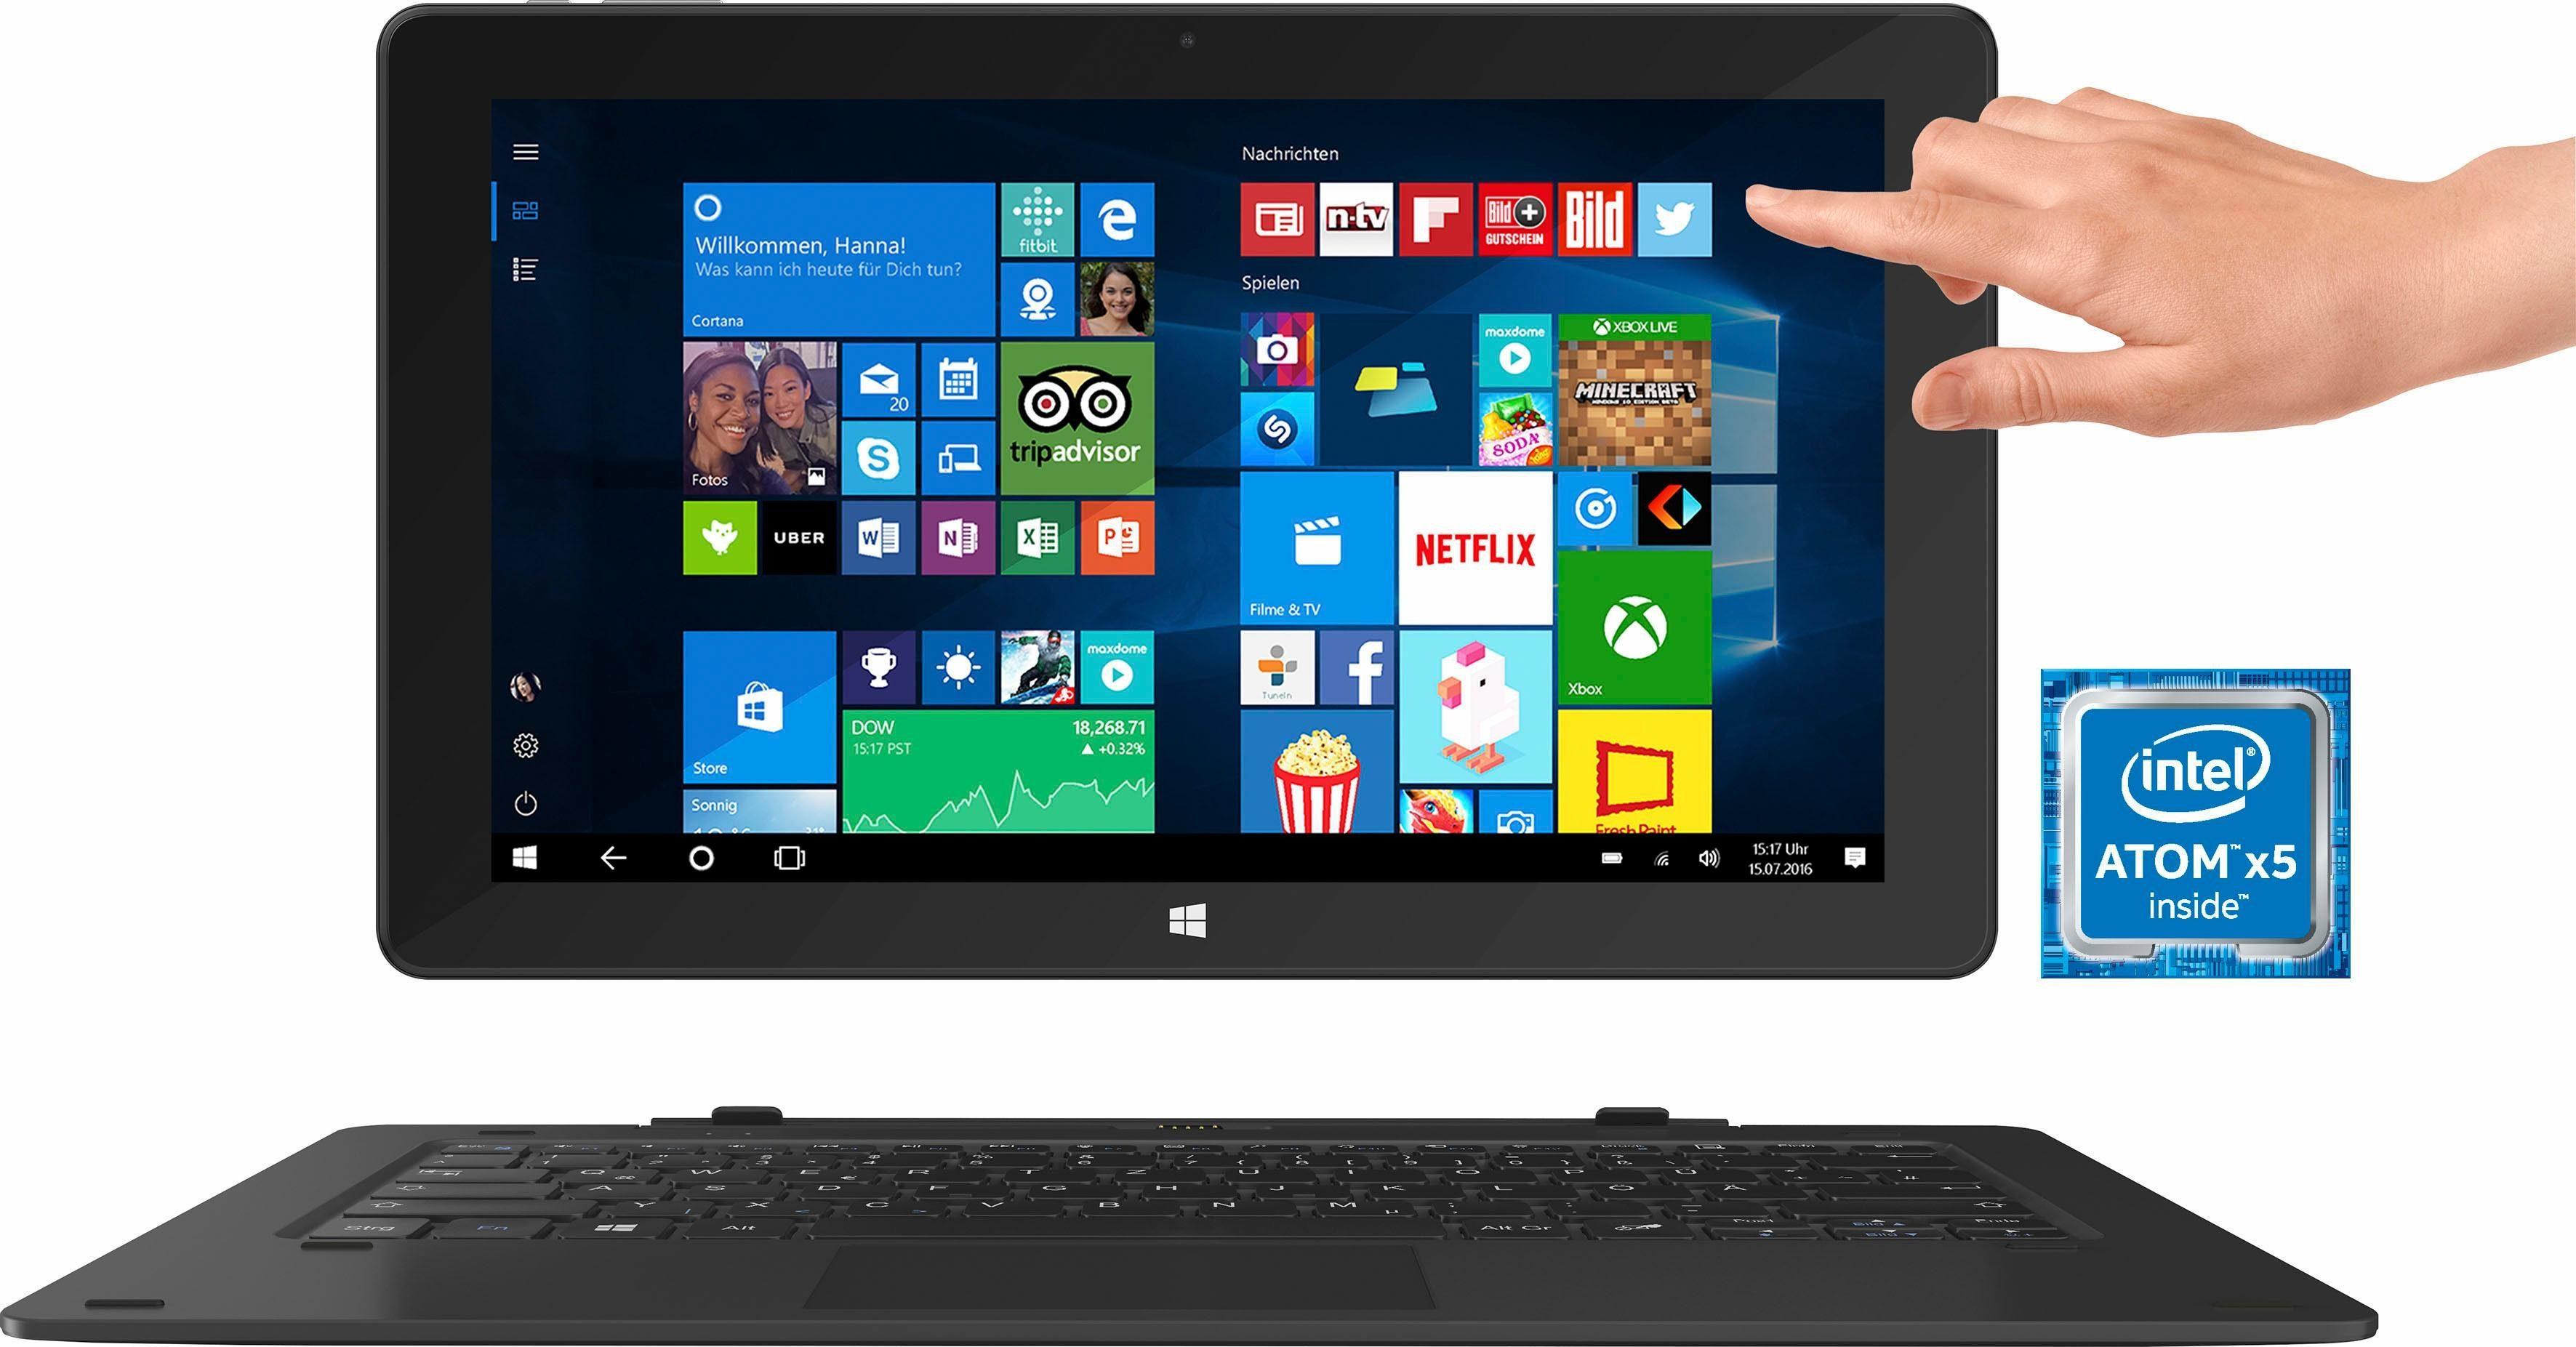 TrekStor SurfTab twin 11,6 WiFi - Volks-Tablet Tablet-PC, Microsoft® Windows® 10 Home, Quad-Core